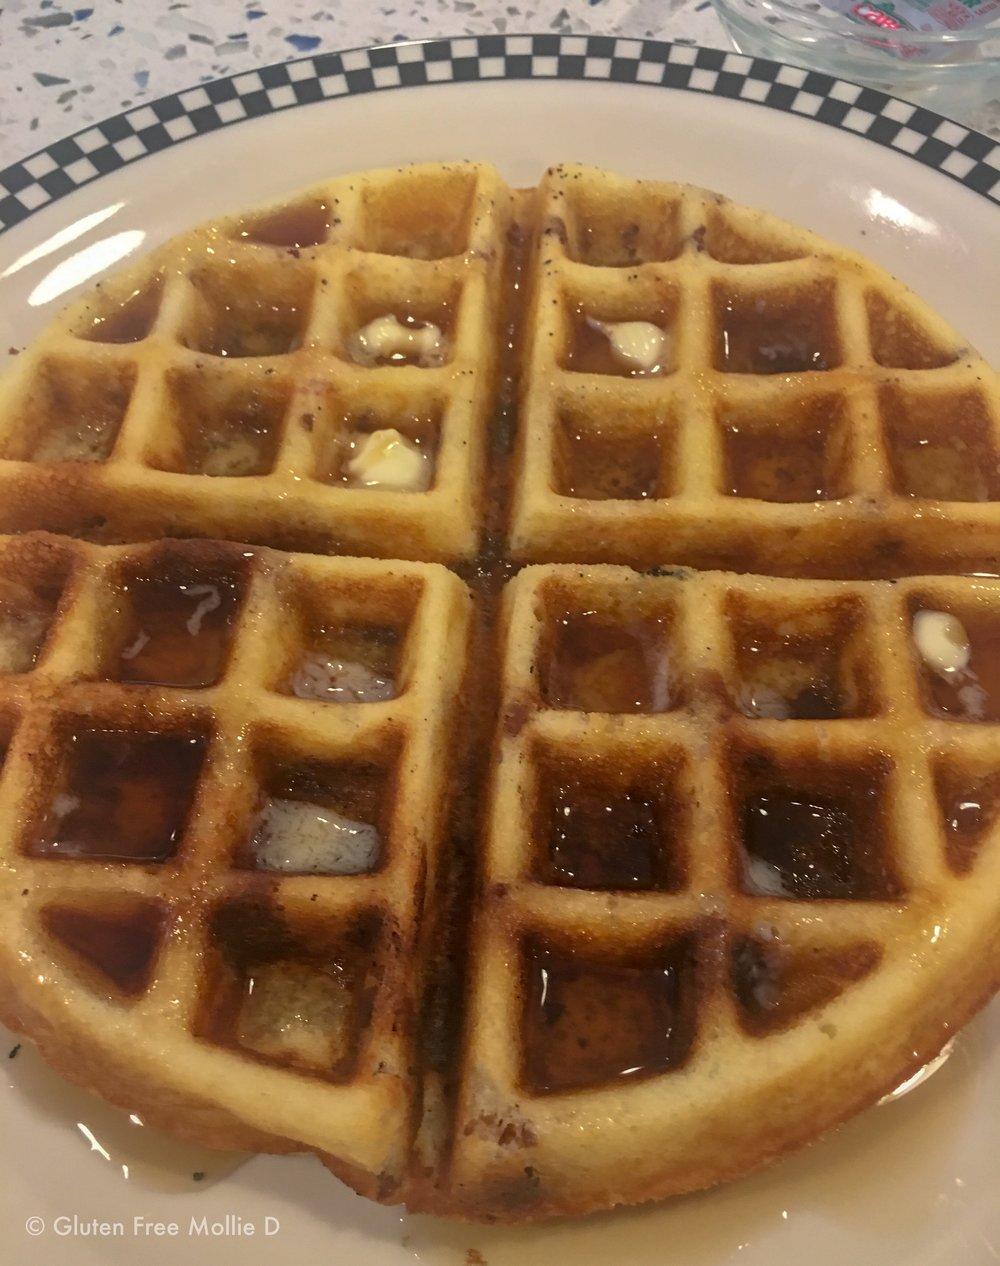 Bacon waffle.